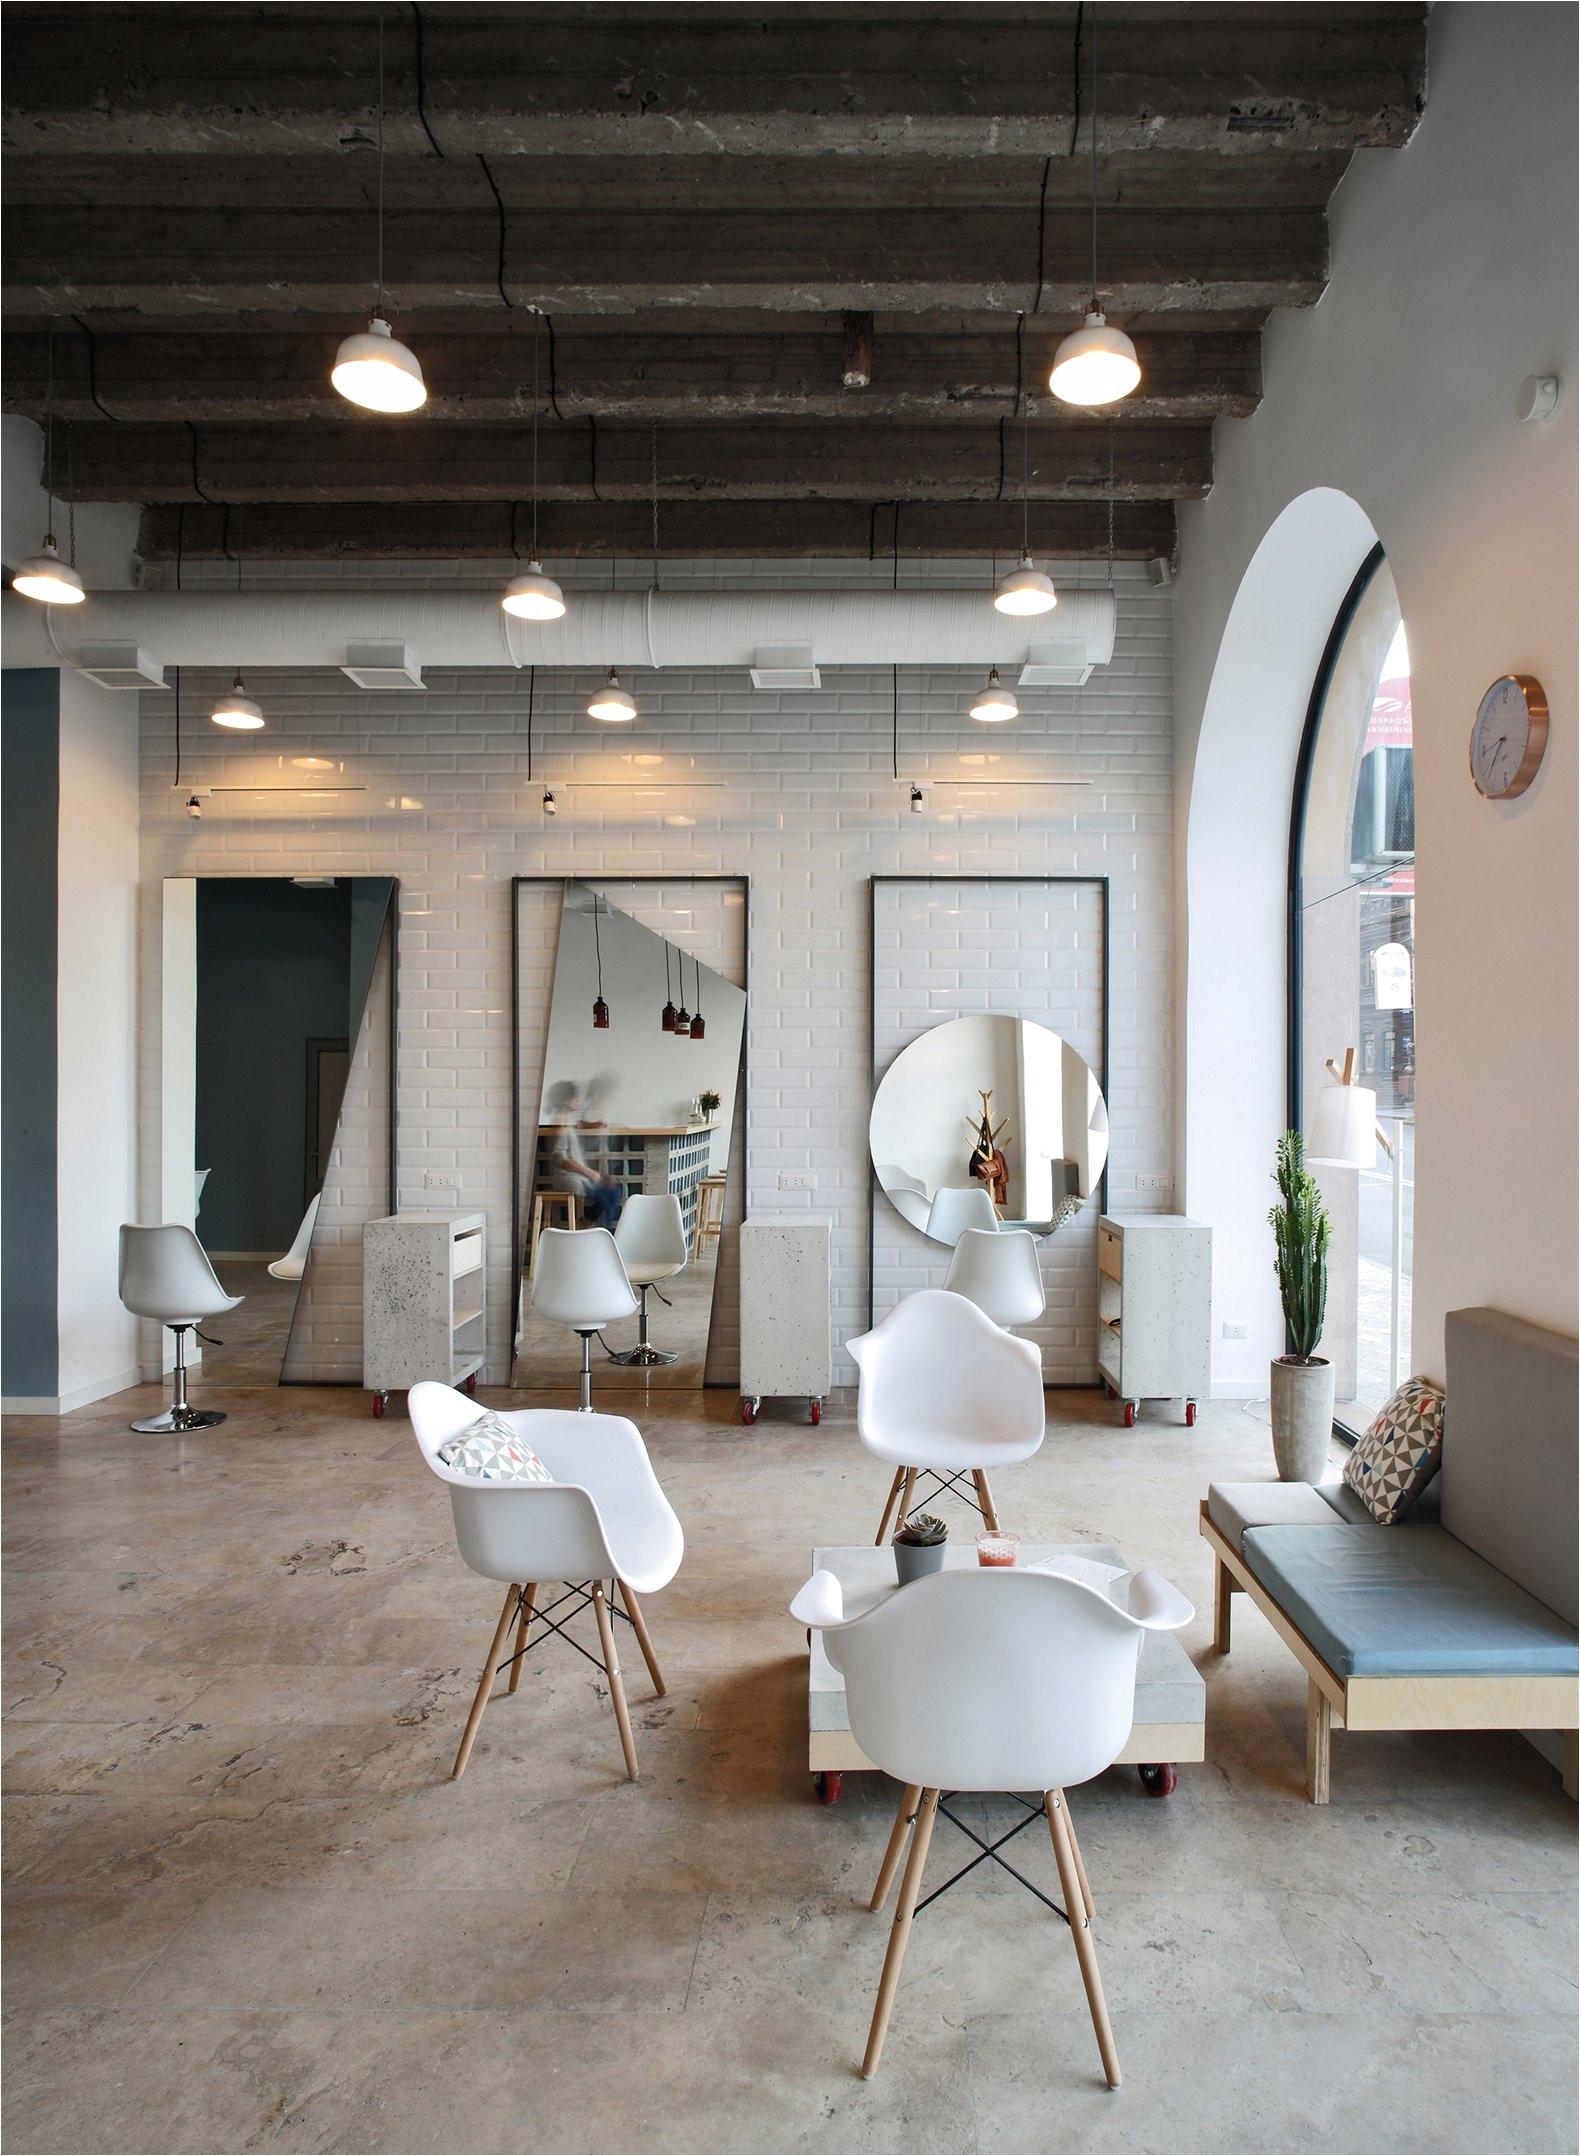 interior design schools buffalo ny elegant od blow dry bar by snkh architectural studio of mezmerizing